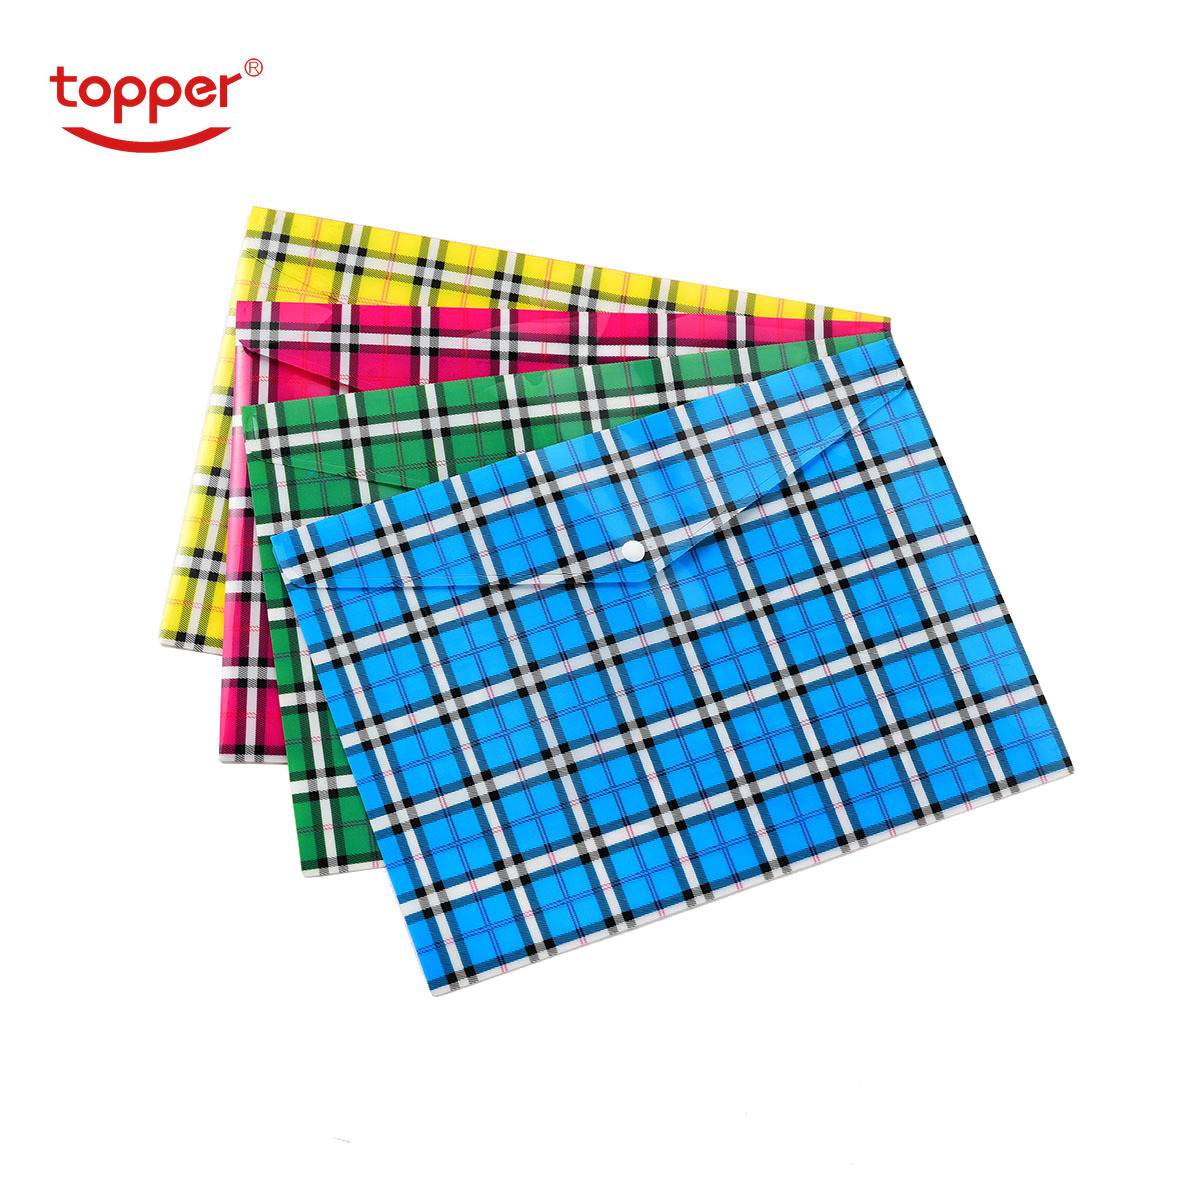 12pcs/set freeshipingA4/FC size opaque printed Plastic document bag Folders Filing Paper Storage Office School Supplies file bag